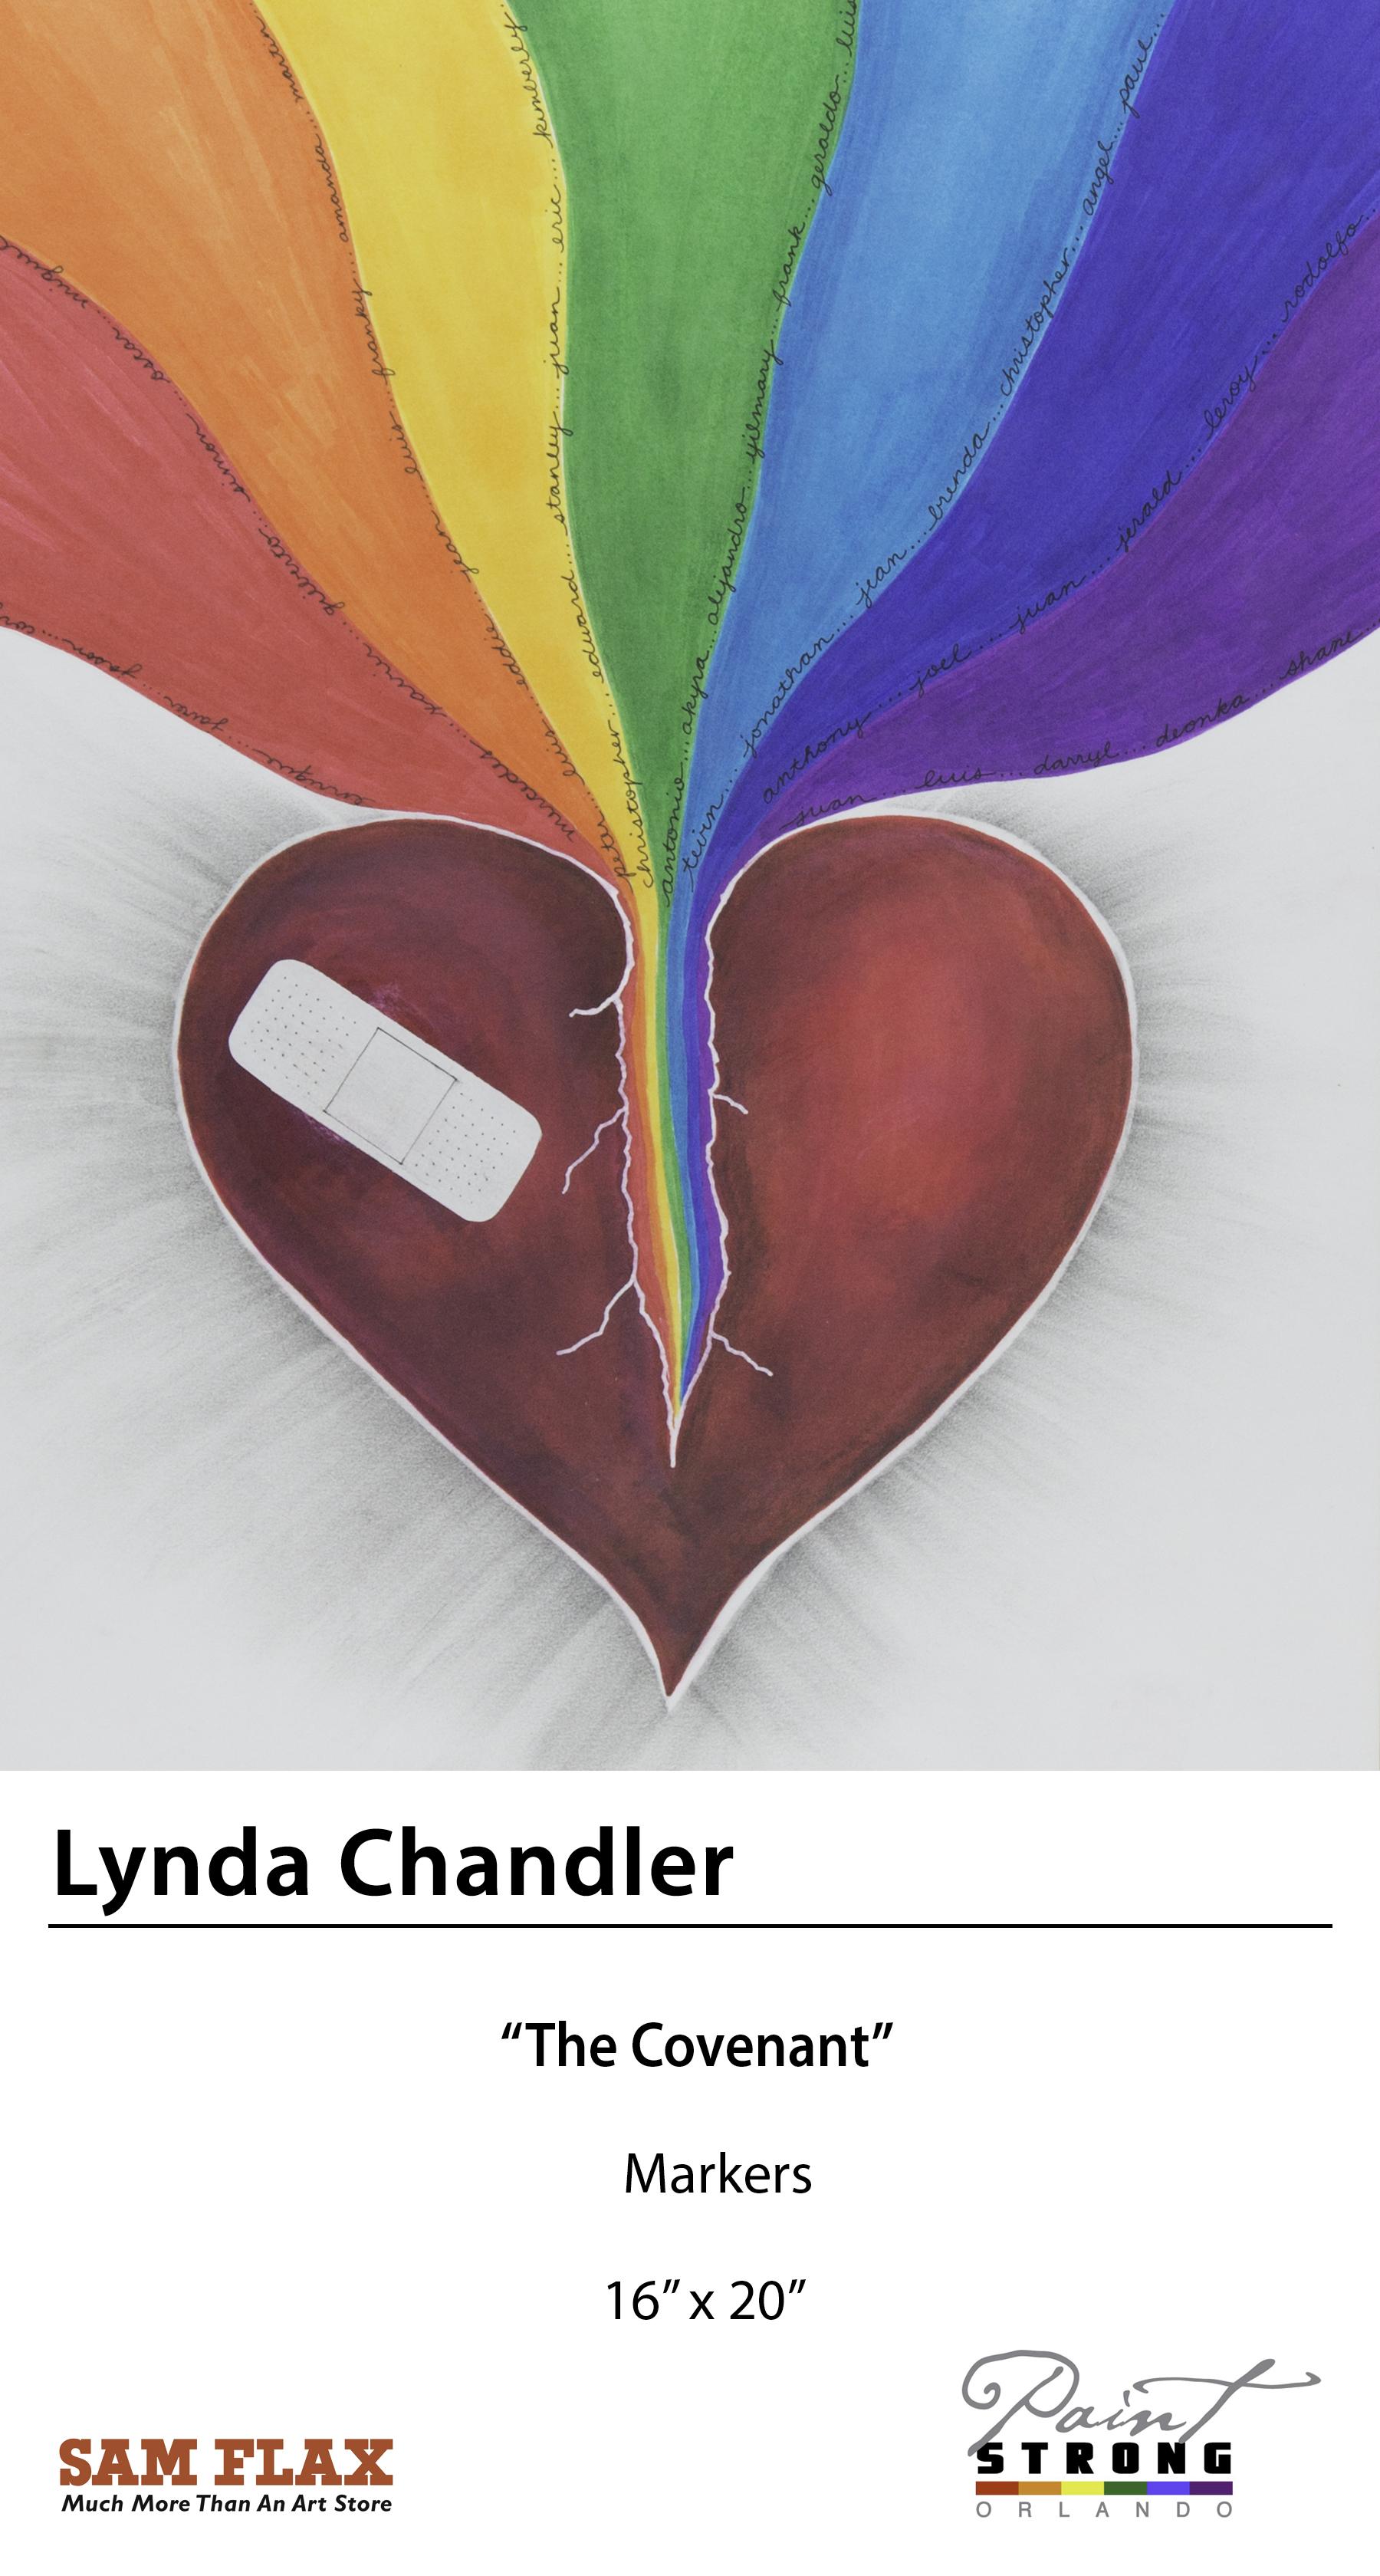 Lynda Chandler